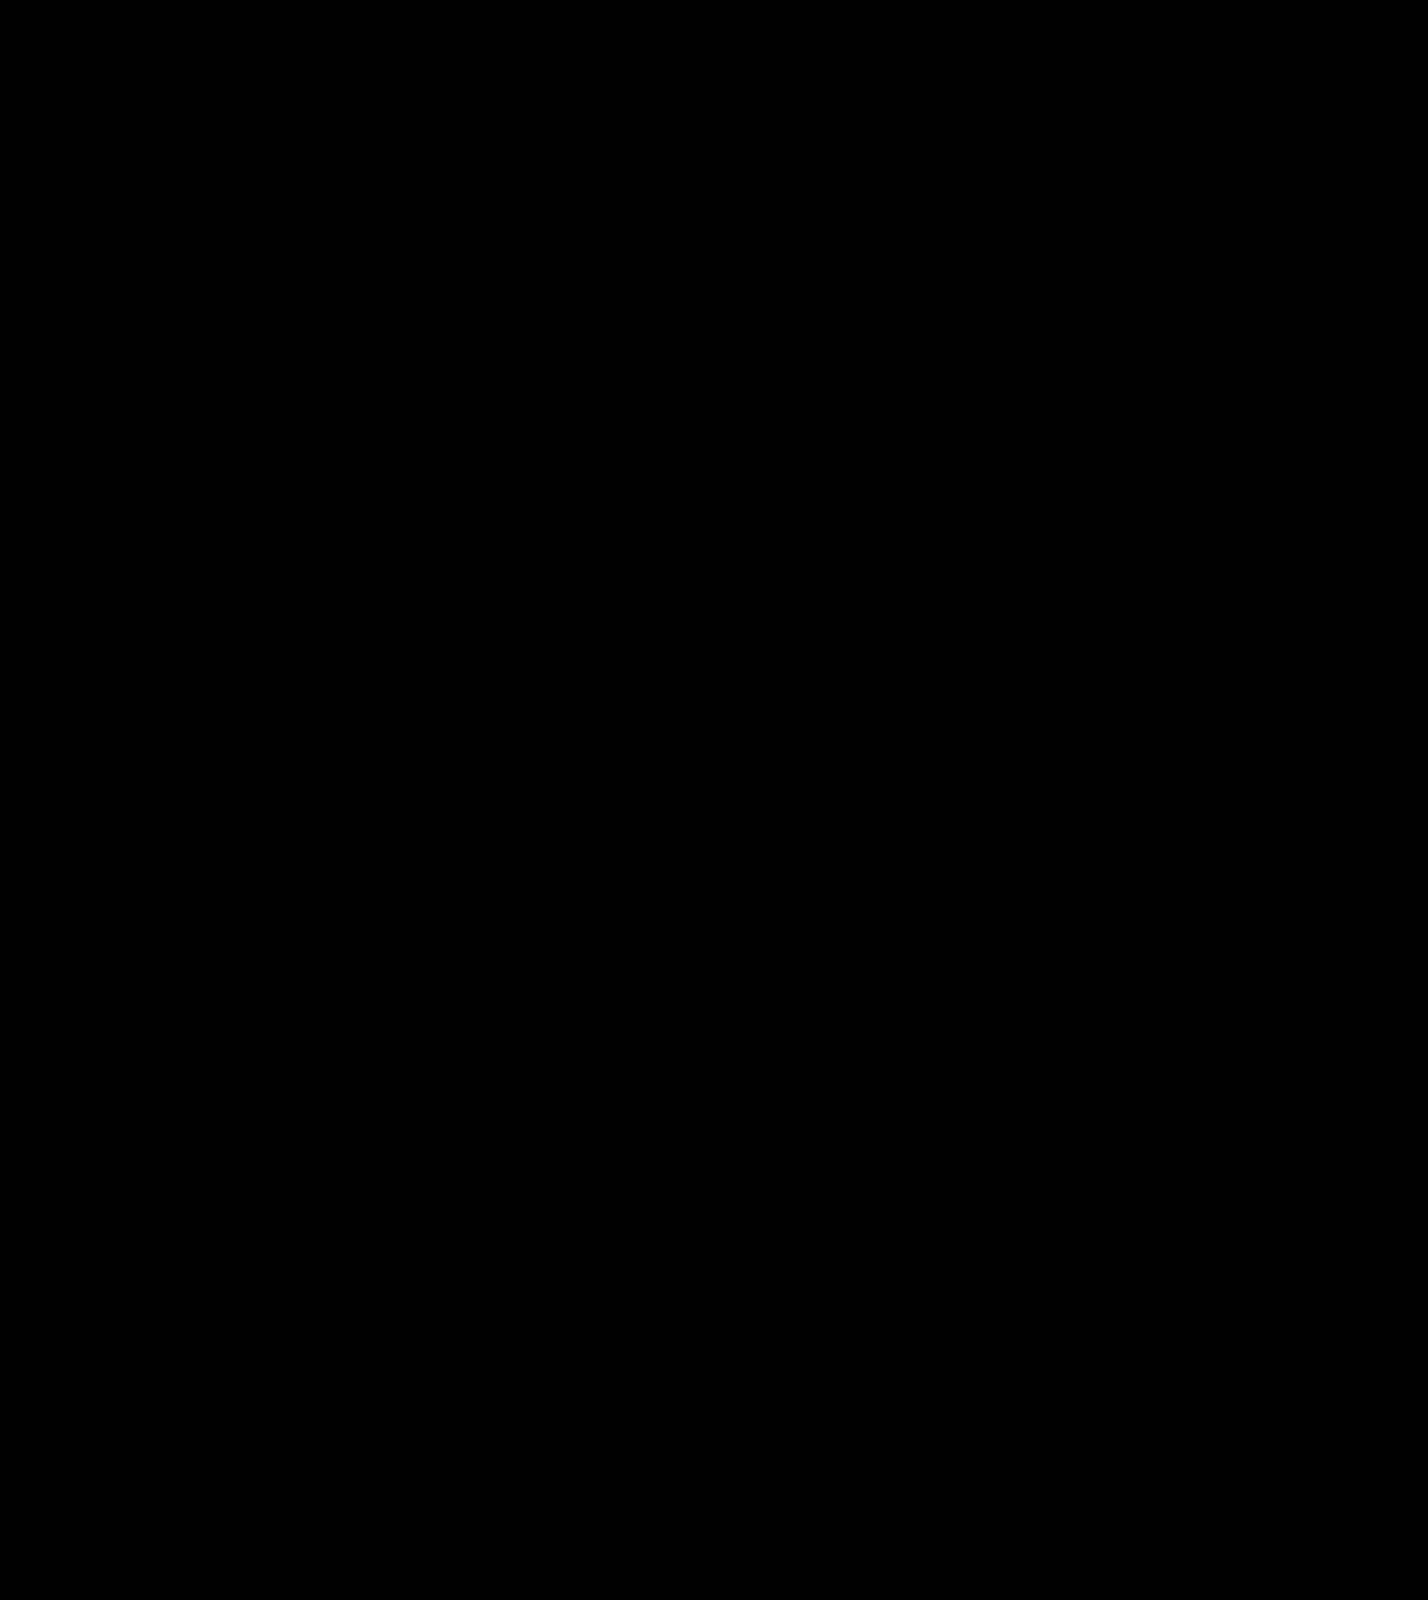 logodol ロゴドル: 番外編:三 ... : 三年漢字 : 漢字